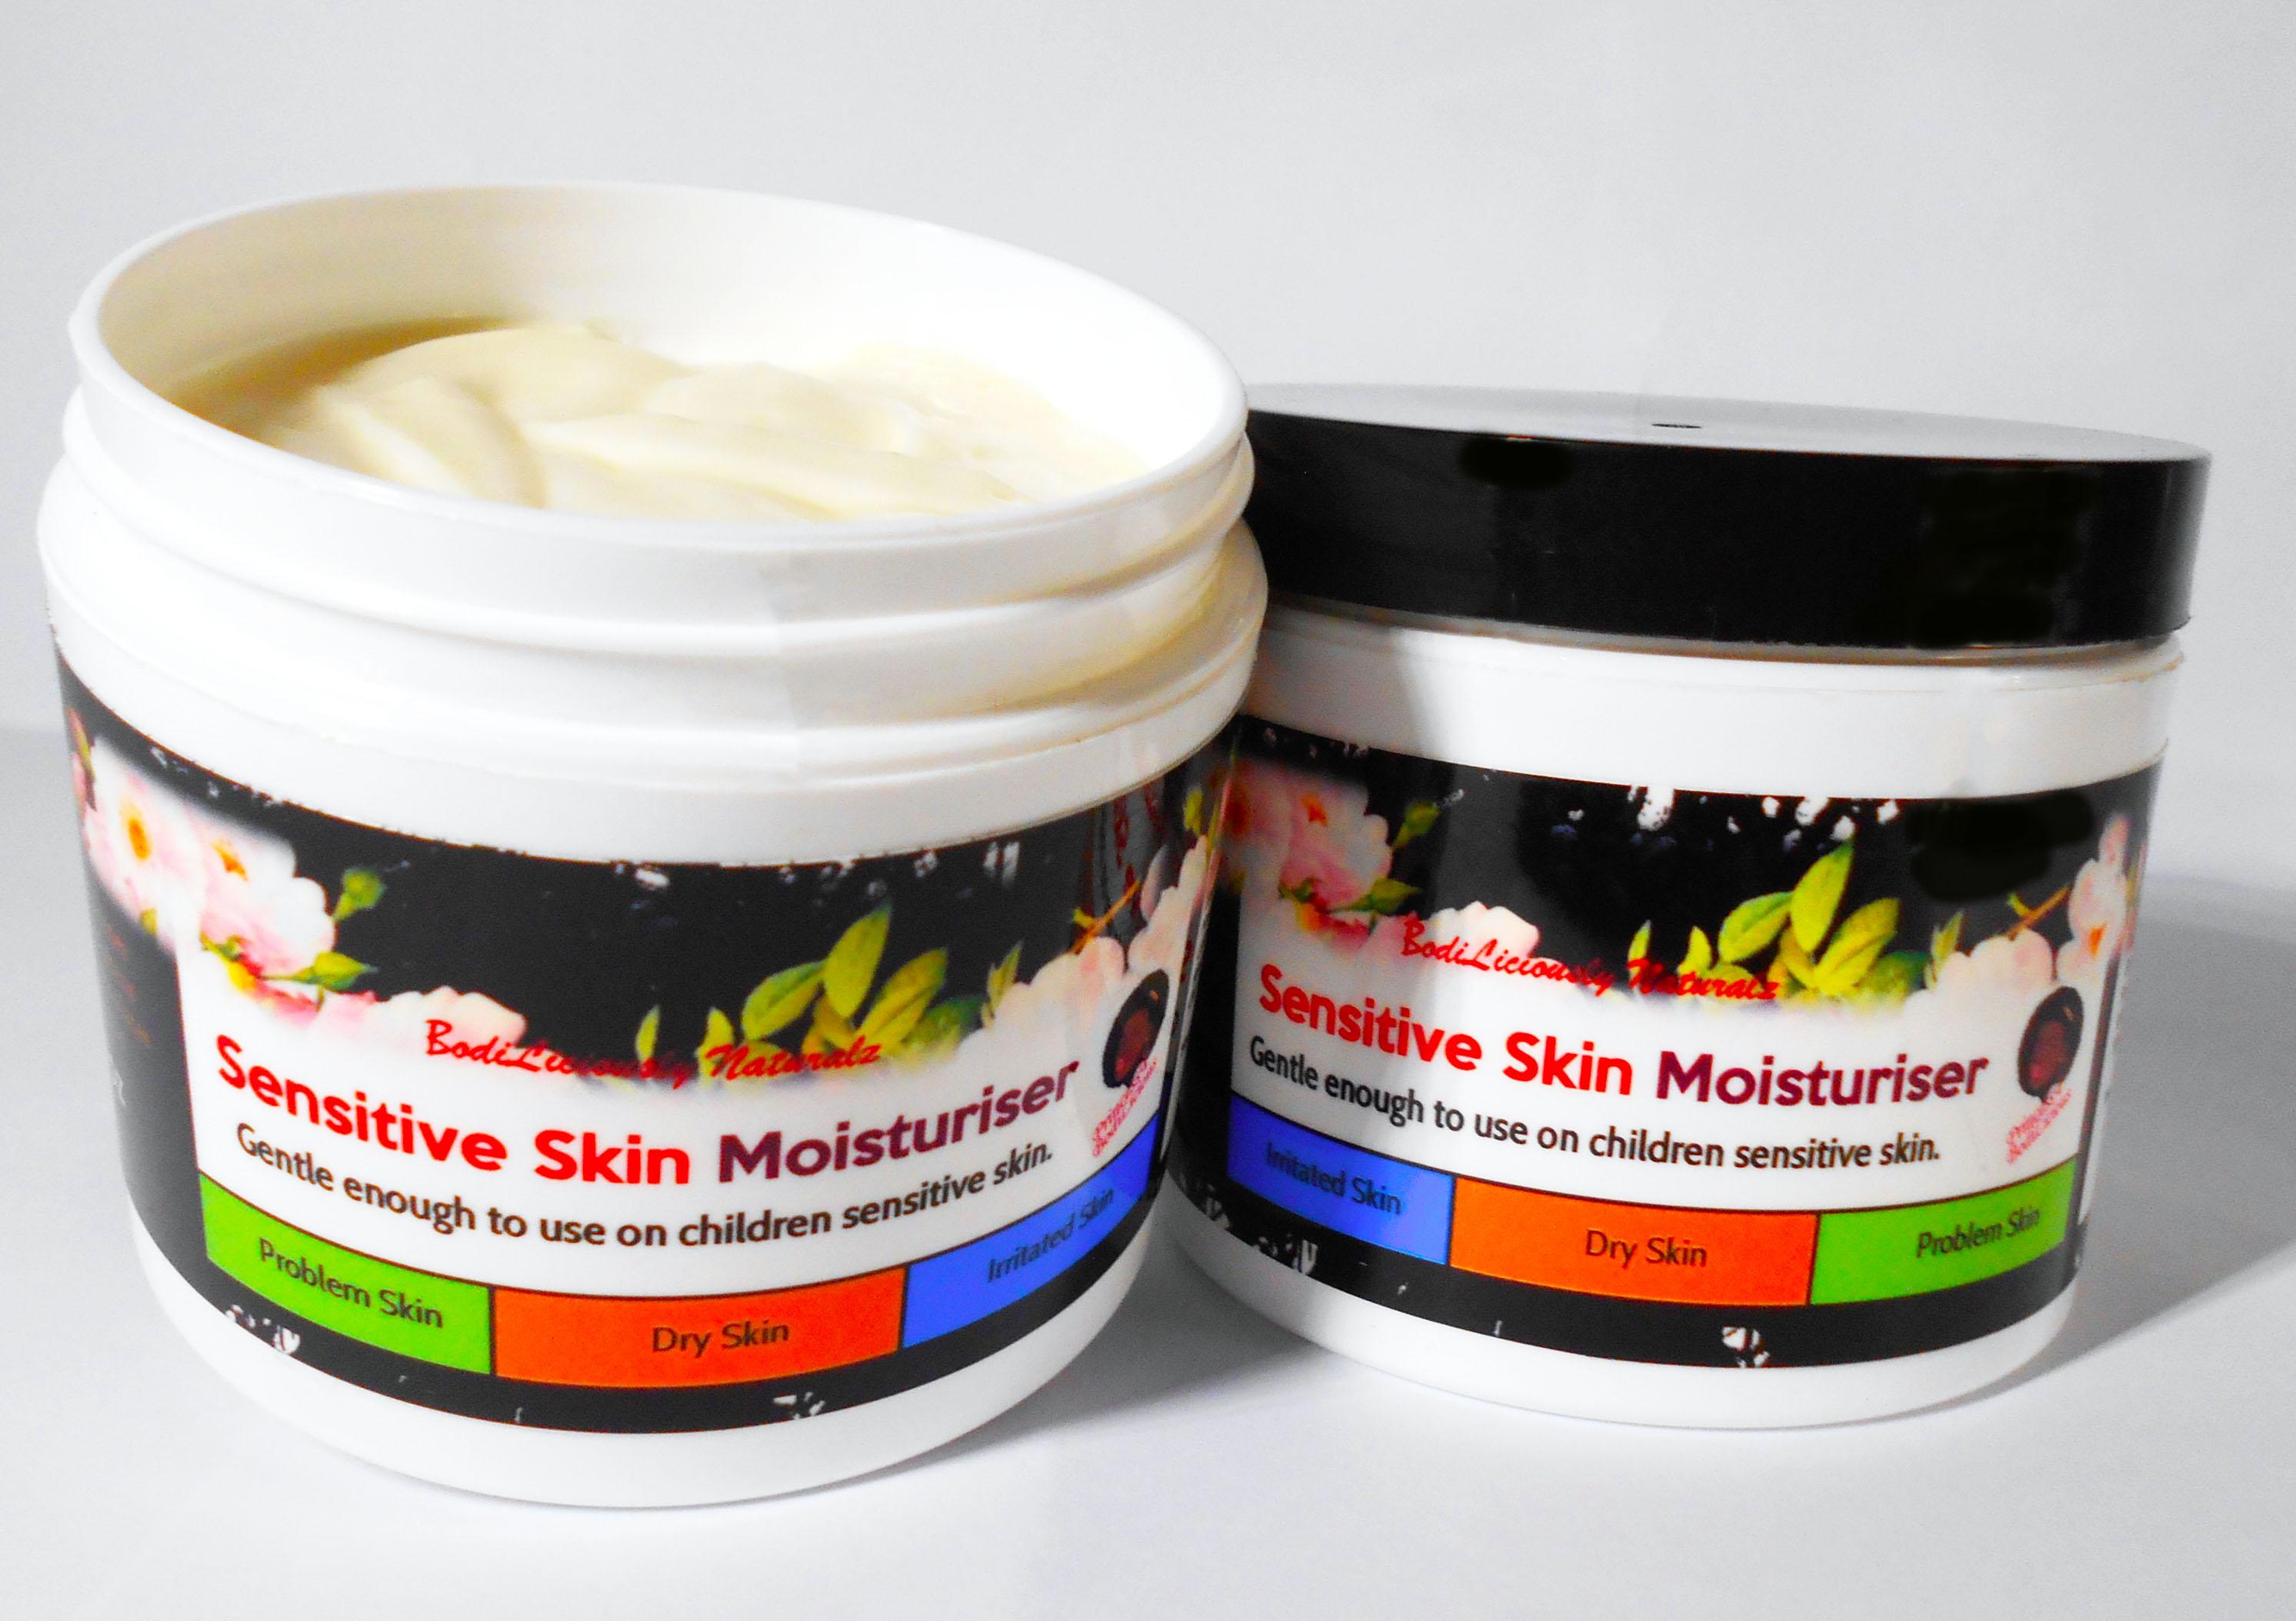 Sensitive Skin Moisturiser